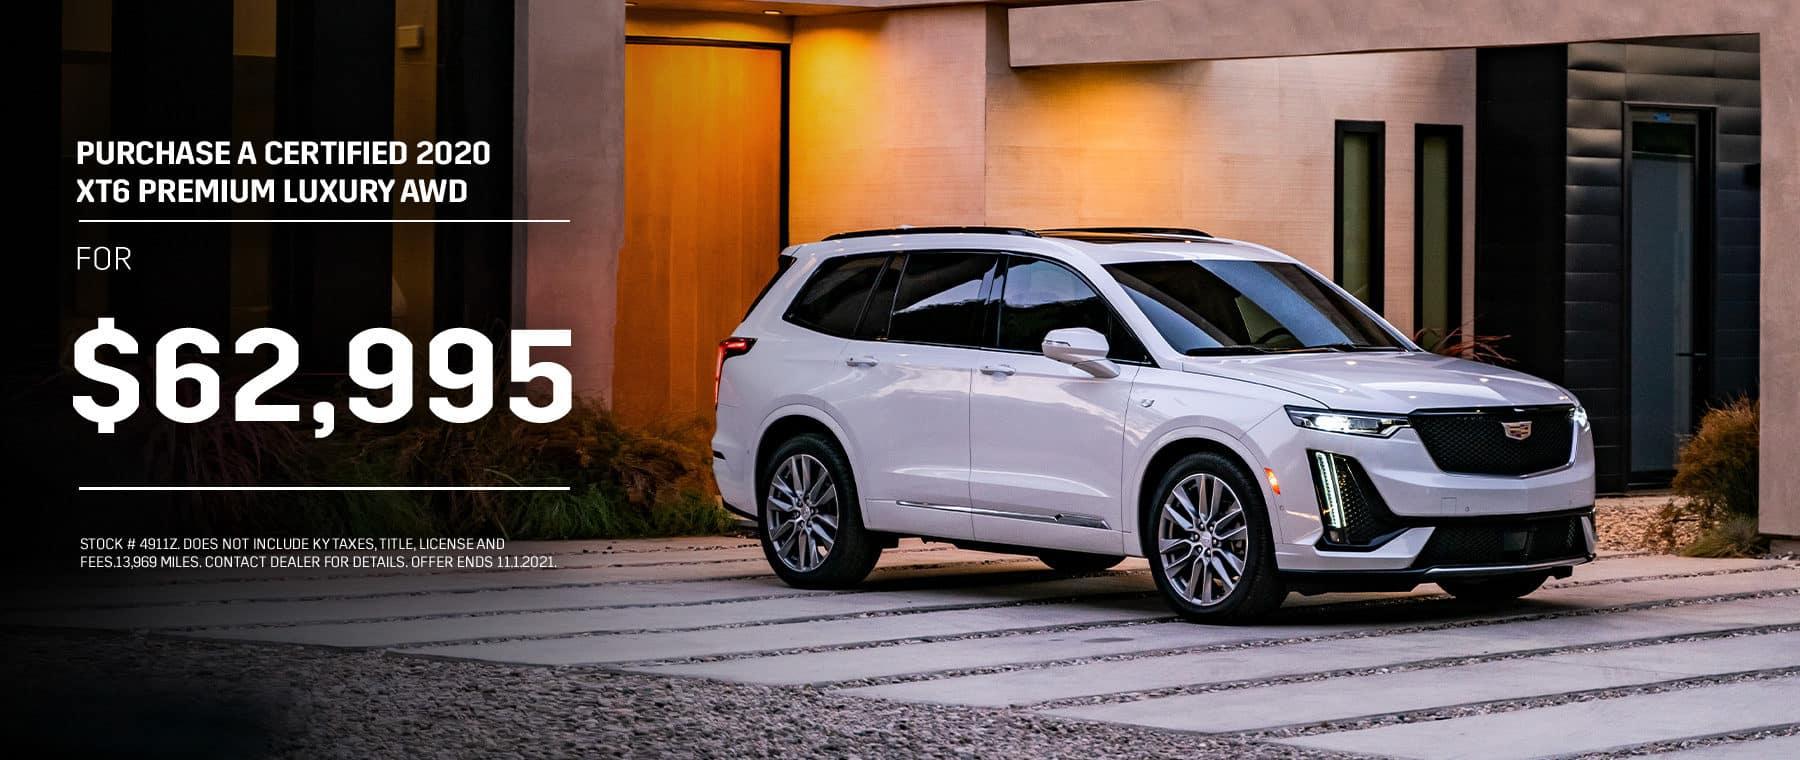 2020 XT6 Premium Luxury AWD For $62,995